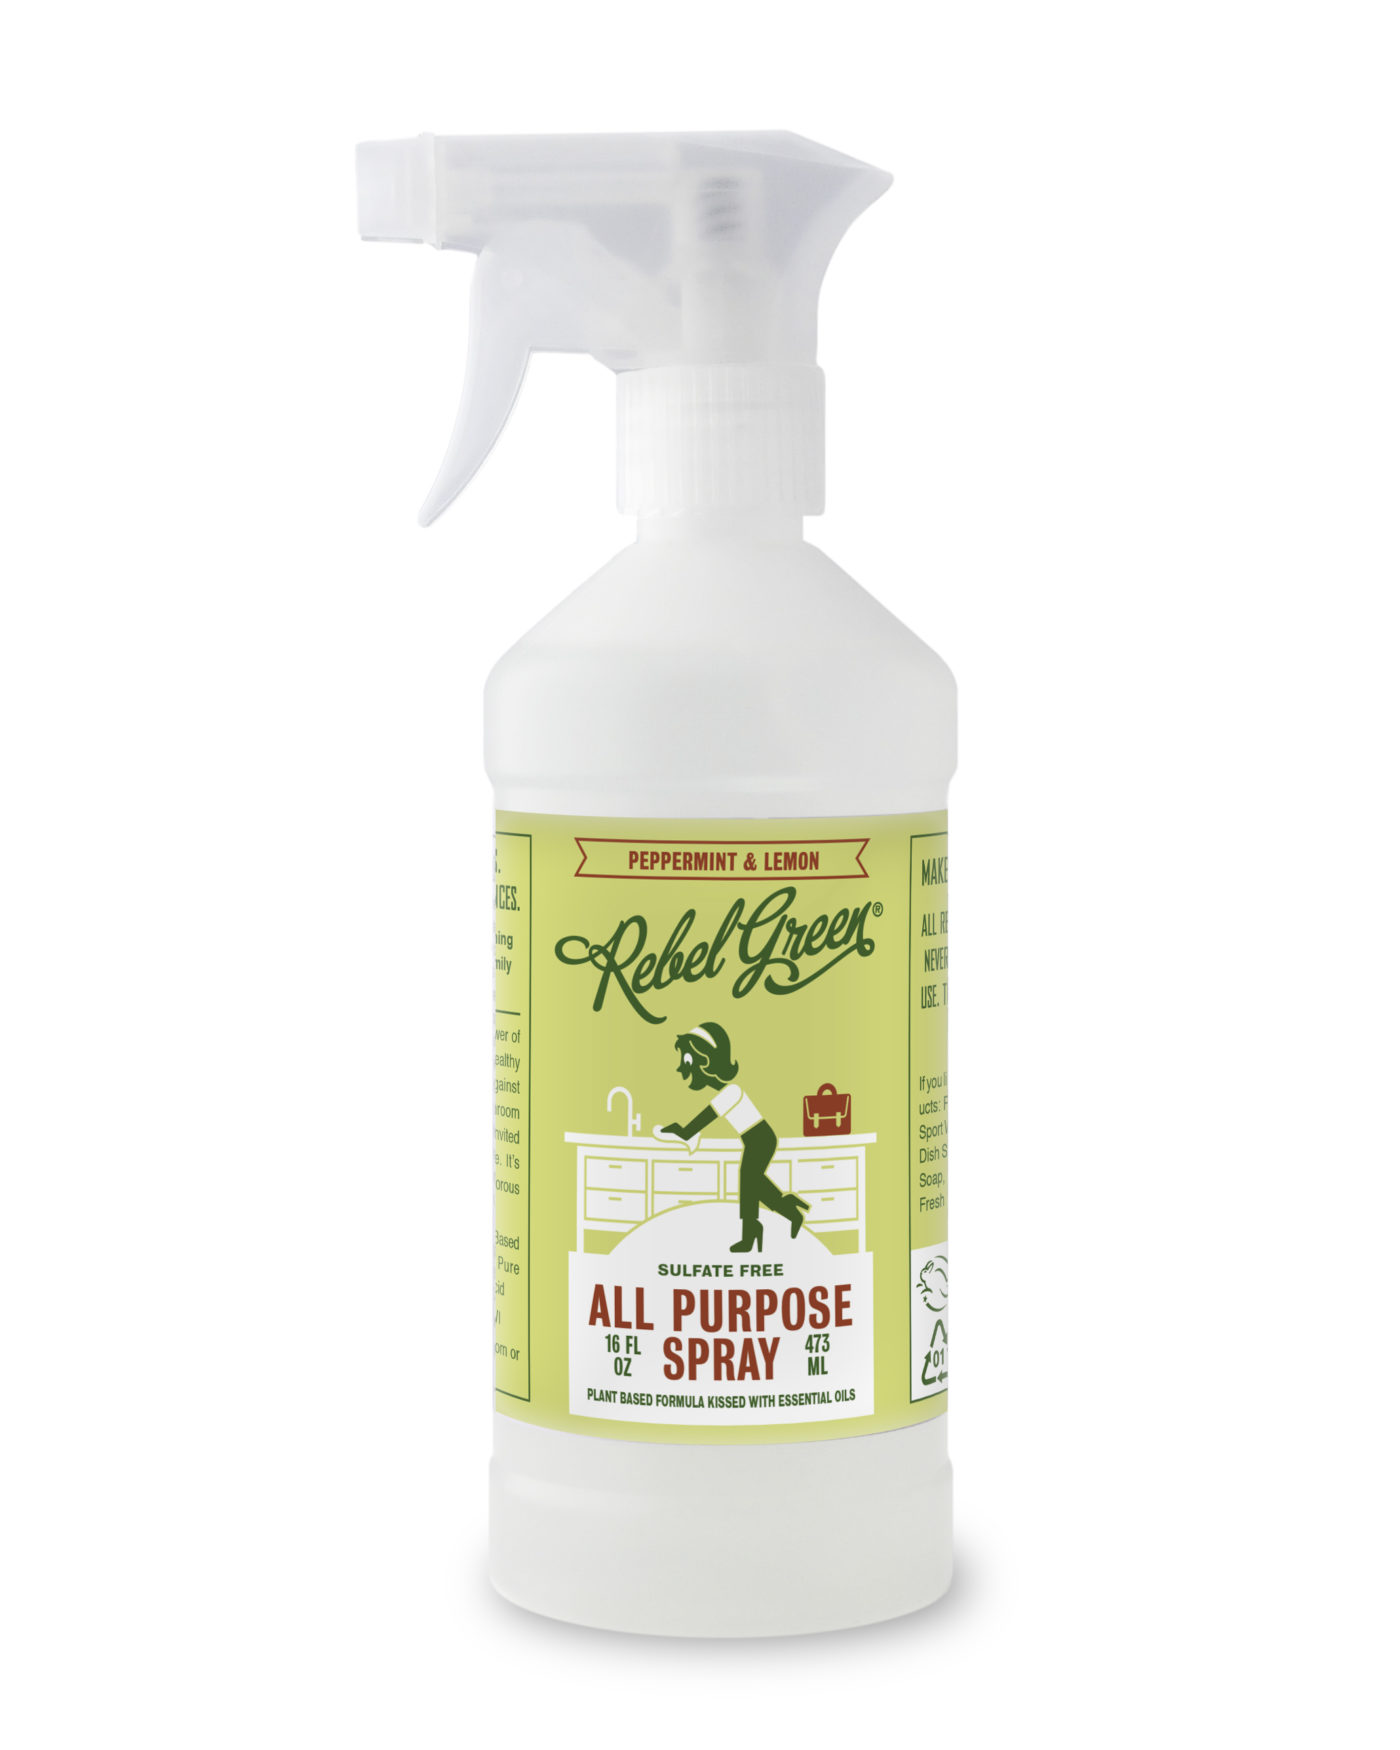 All Purpose Spray Peppermint & Lemon